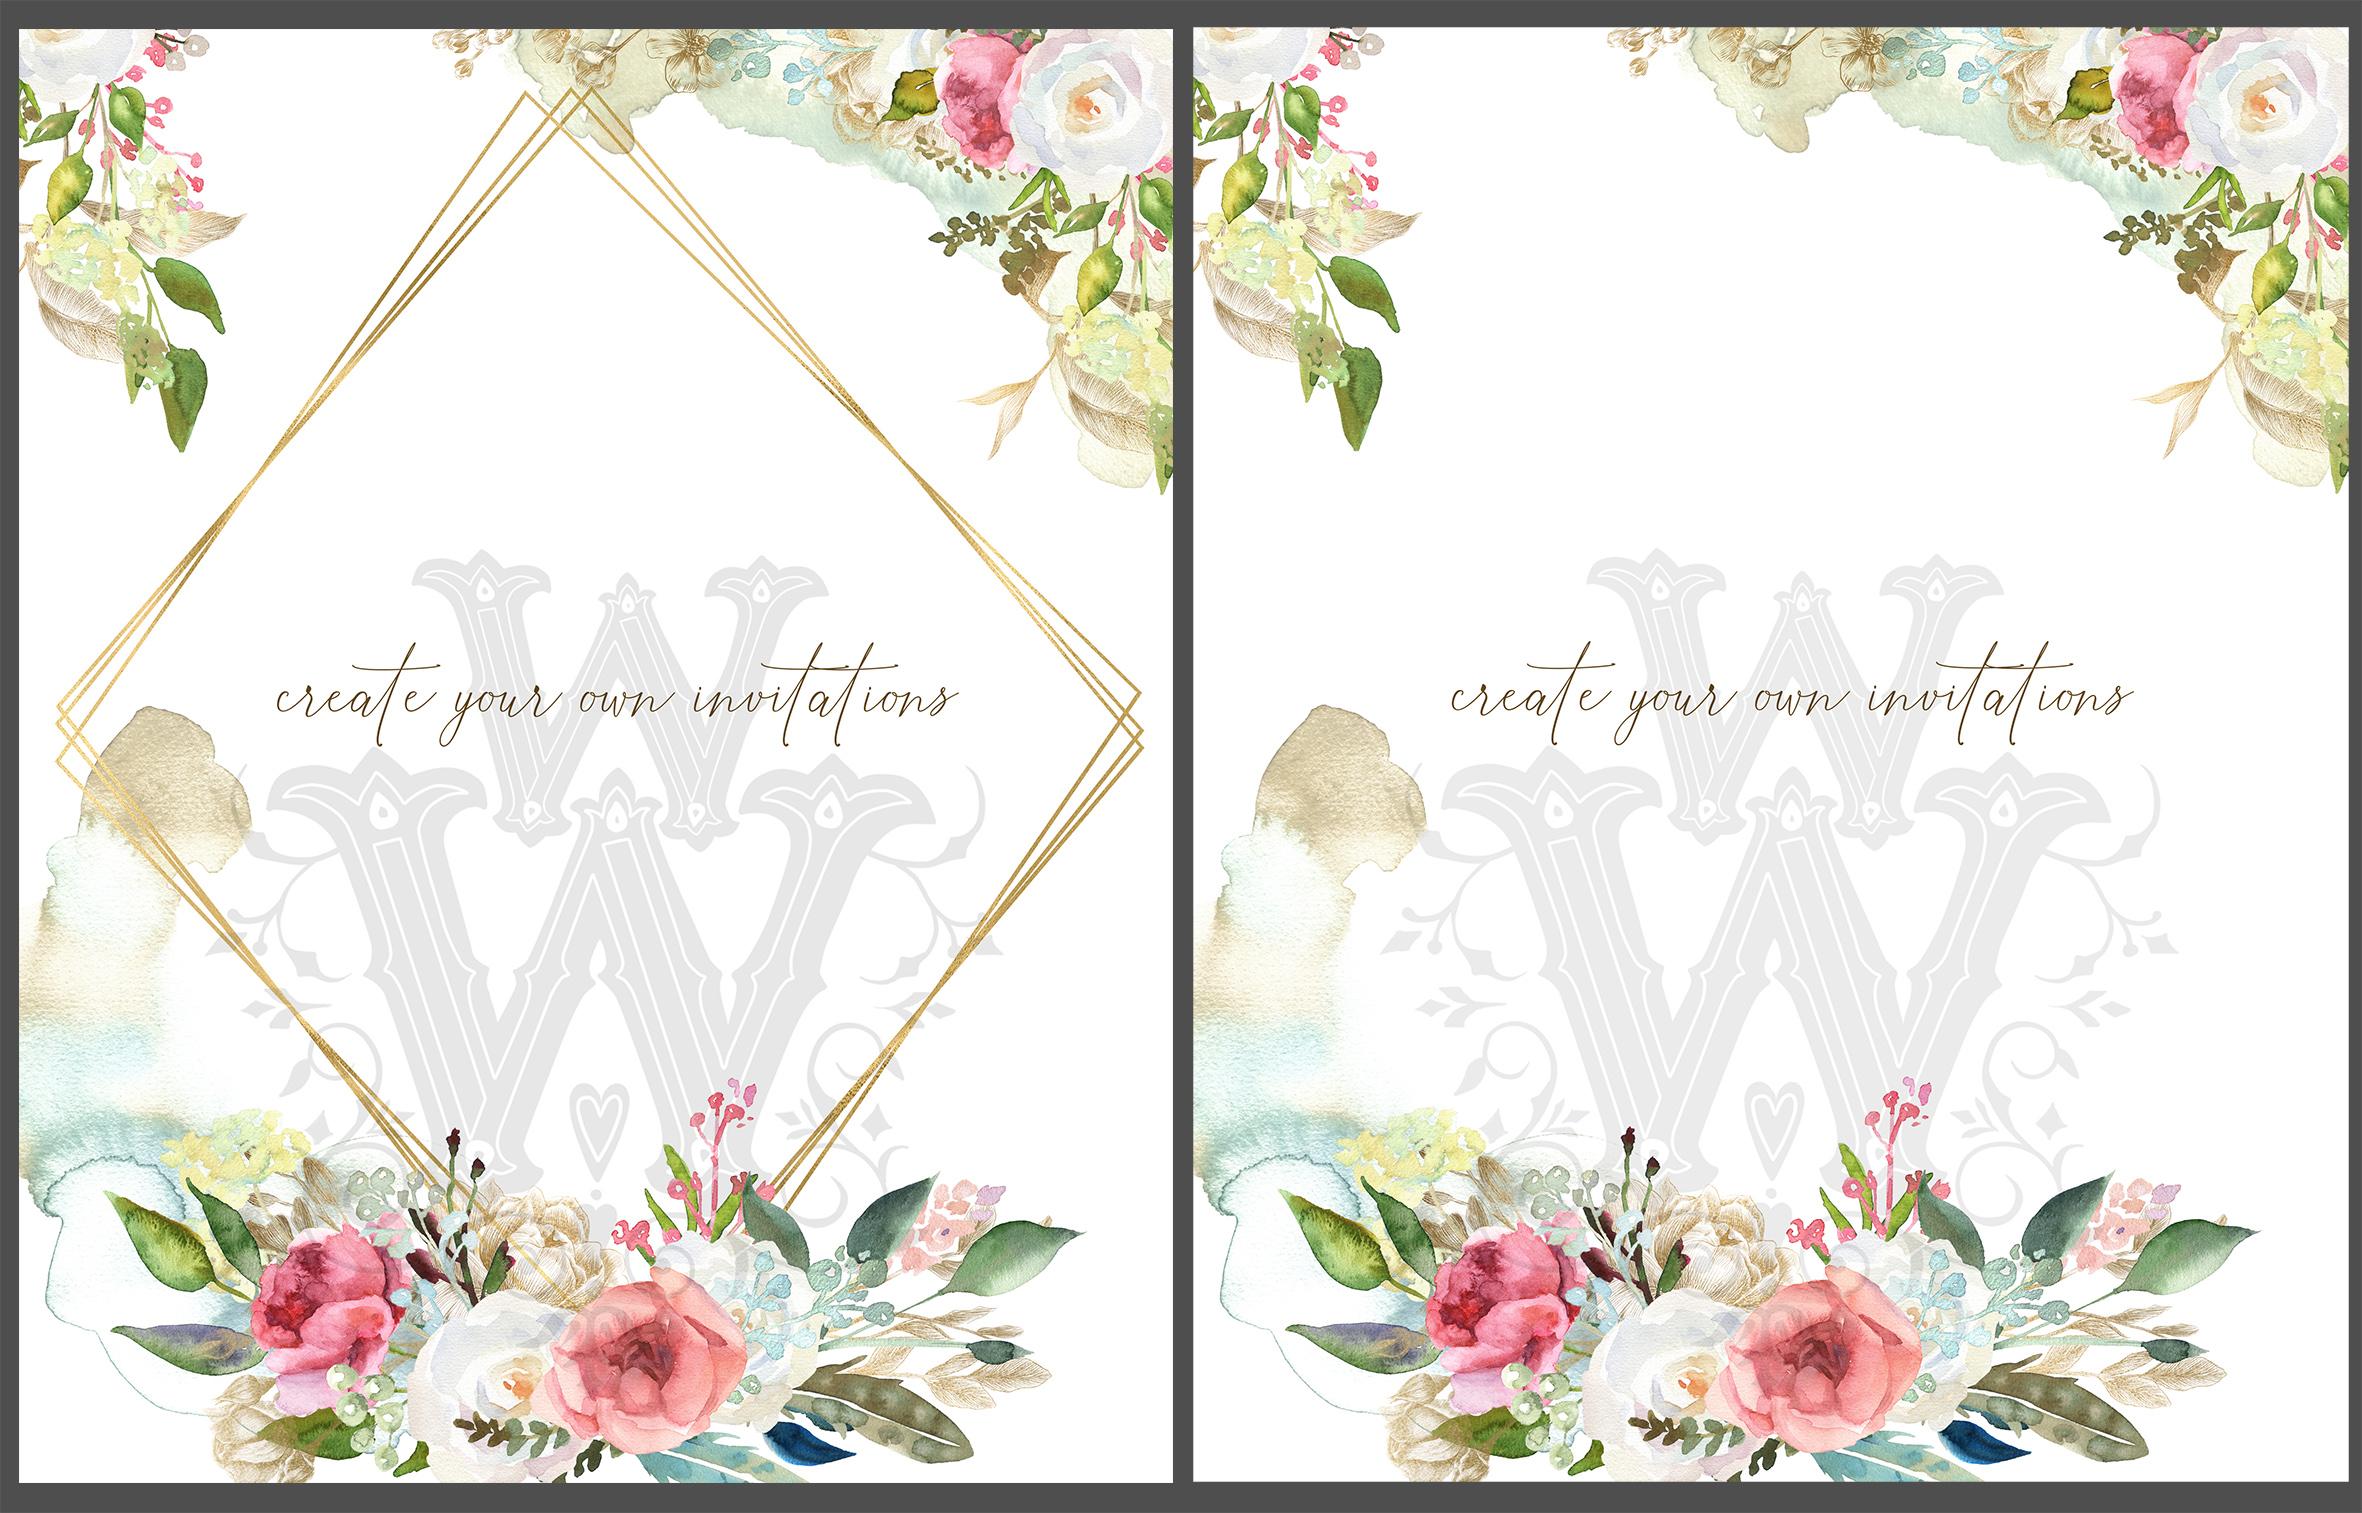 Watercolor rustic wedding bouquets clipart, vintage wreath example image 4